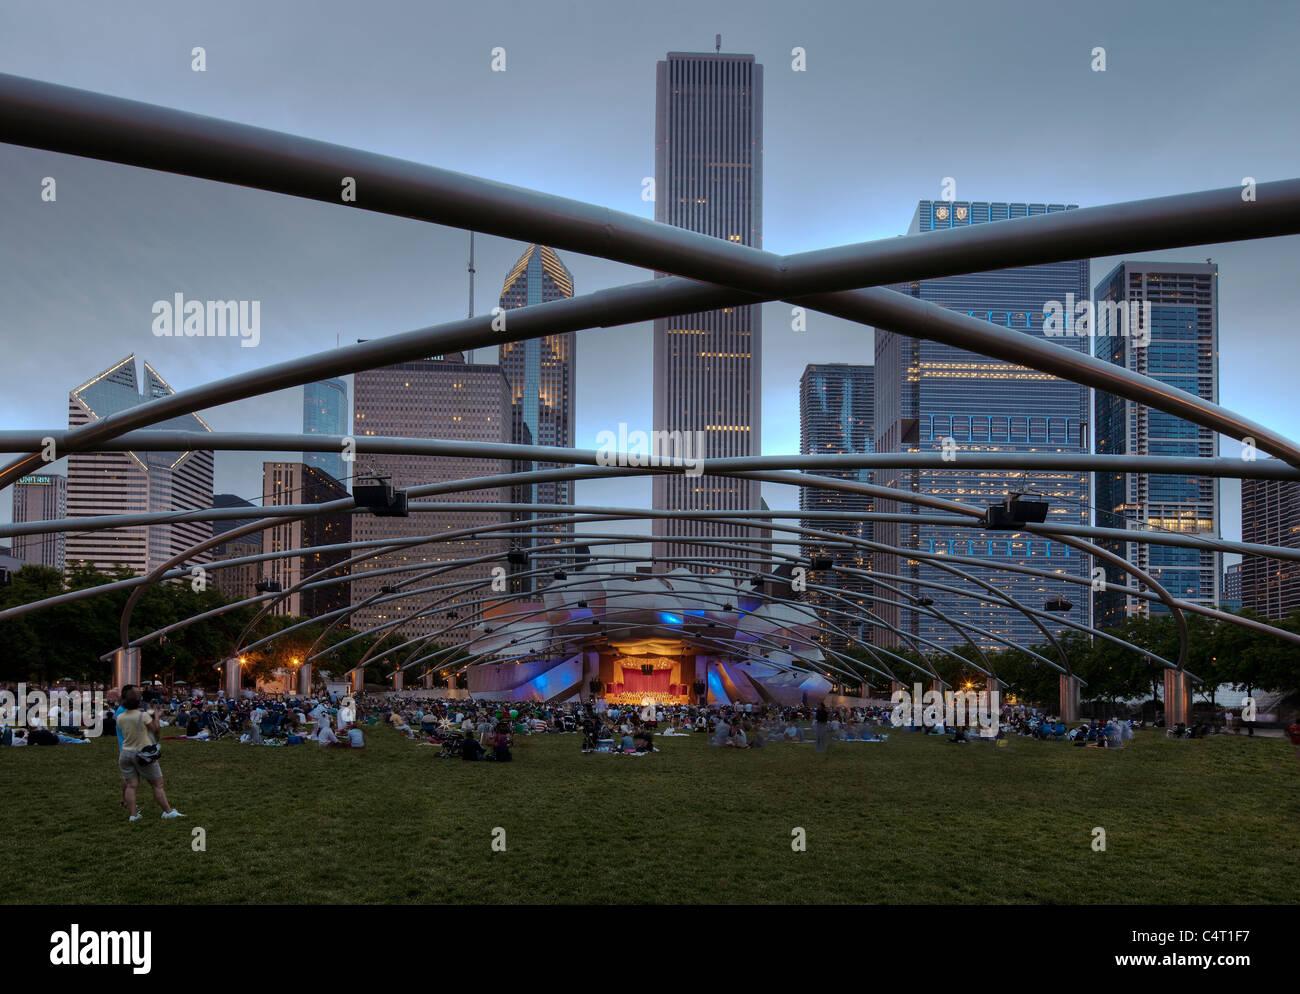 People listen to an evening concert in the Jay Pritzker Pavillion, Millennium Park, Chicago, Illinois. - Stock Image